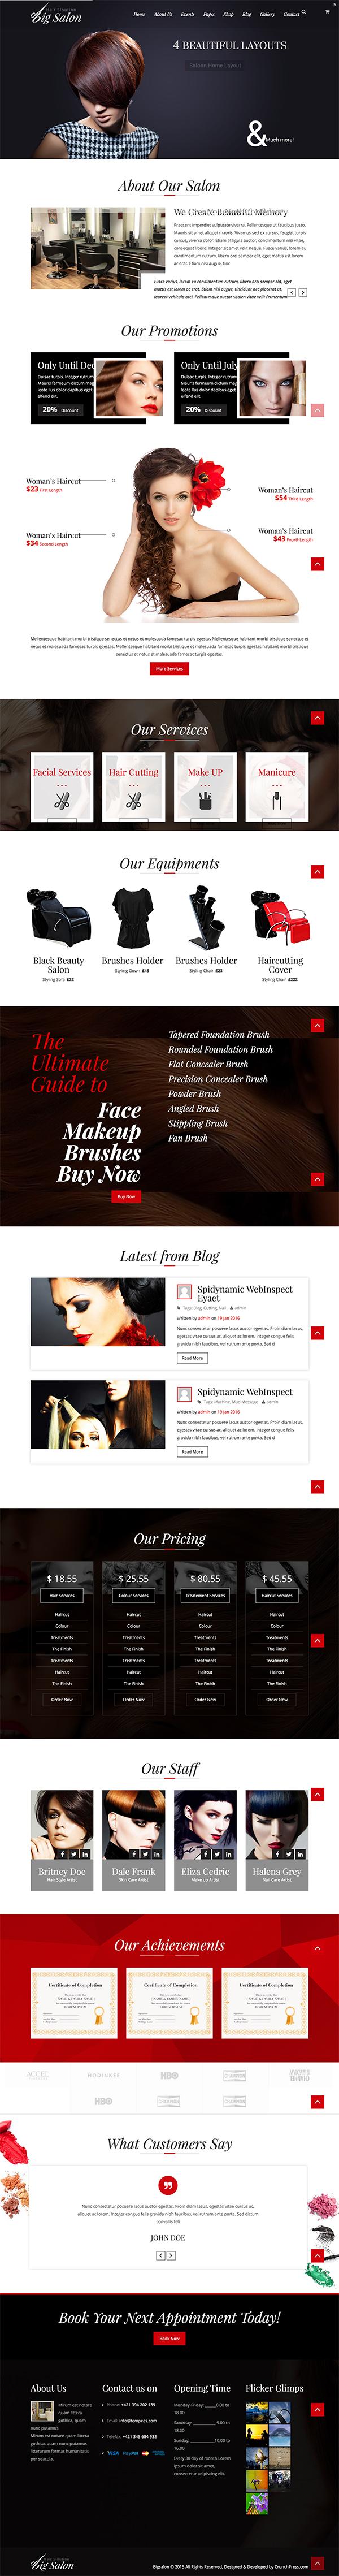 05 Big Salon - WordPress Theme for Hair Salon